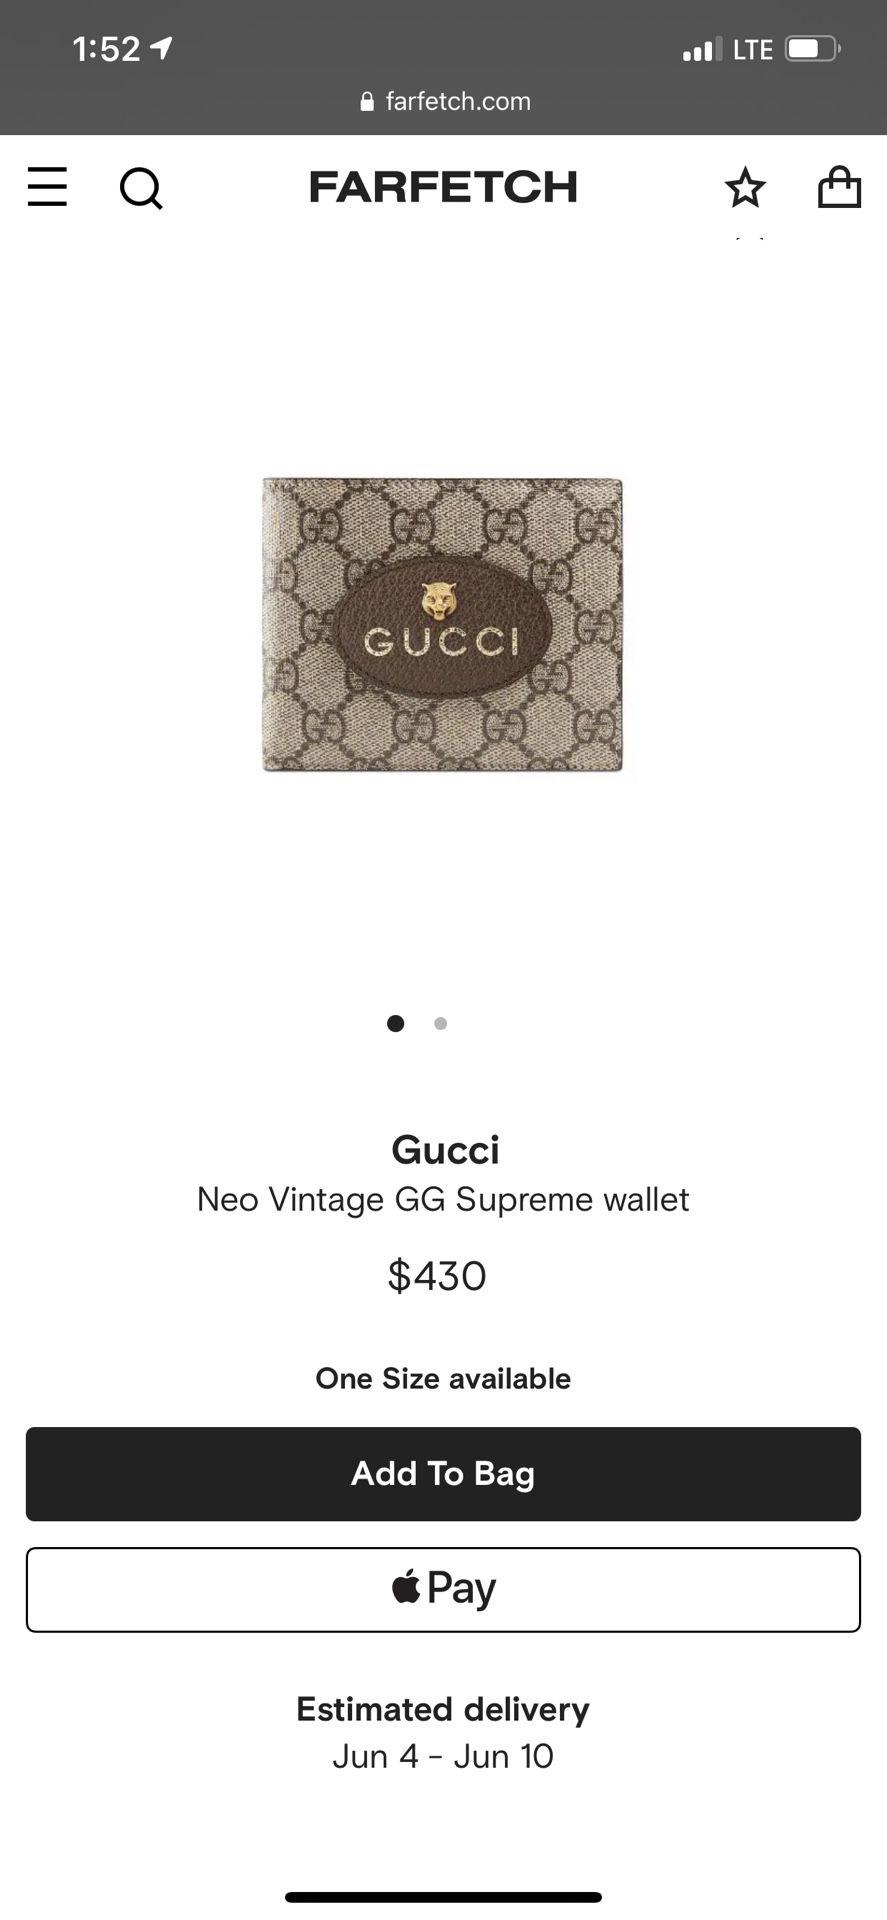 Gucci Neo Vintage GG Supreme wallet